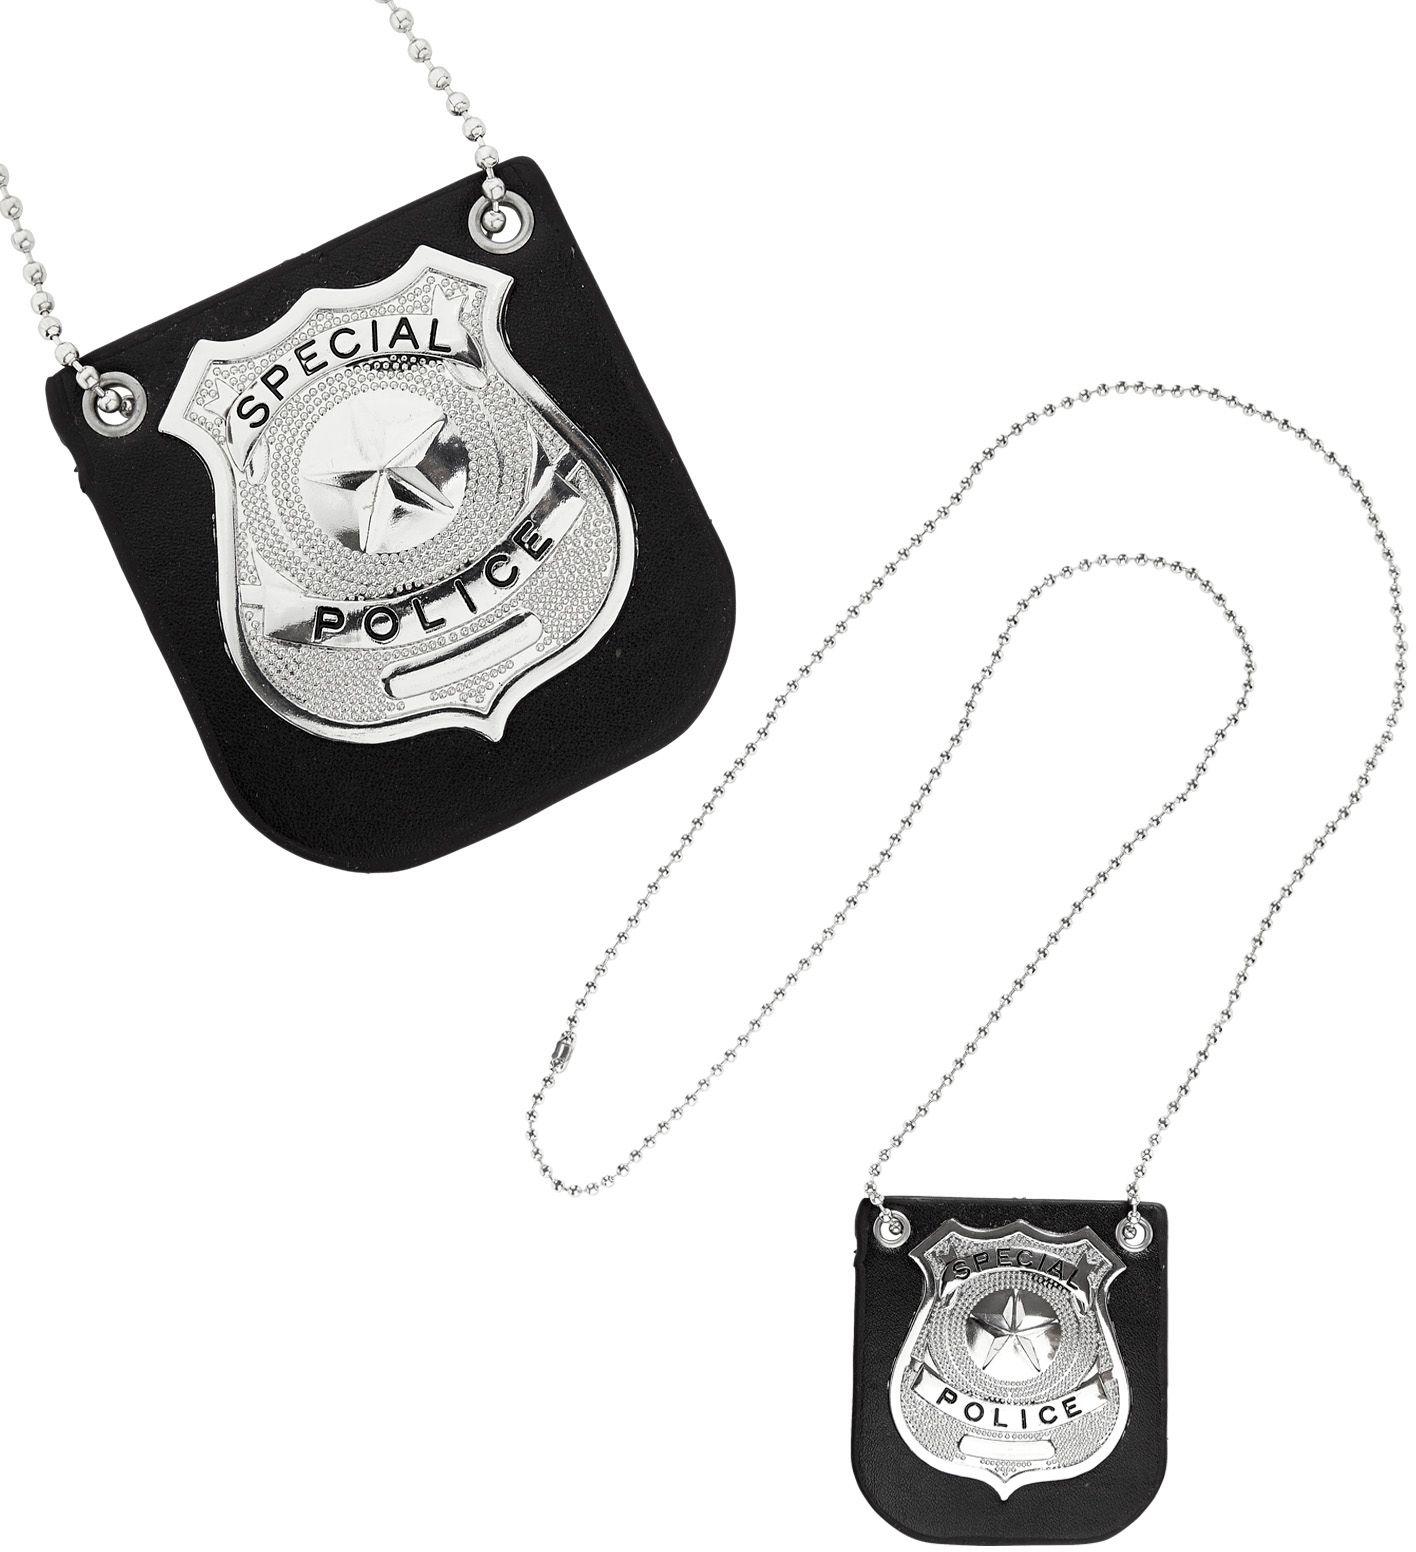 Politie badge ketting